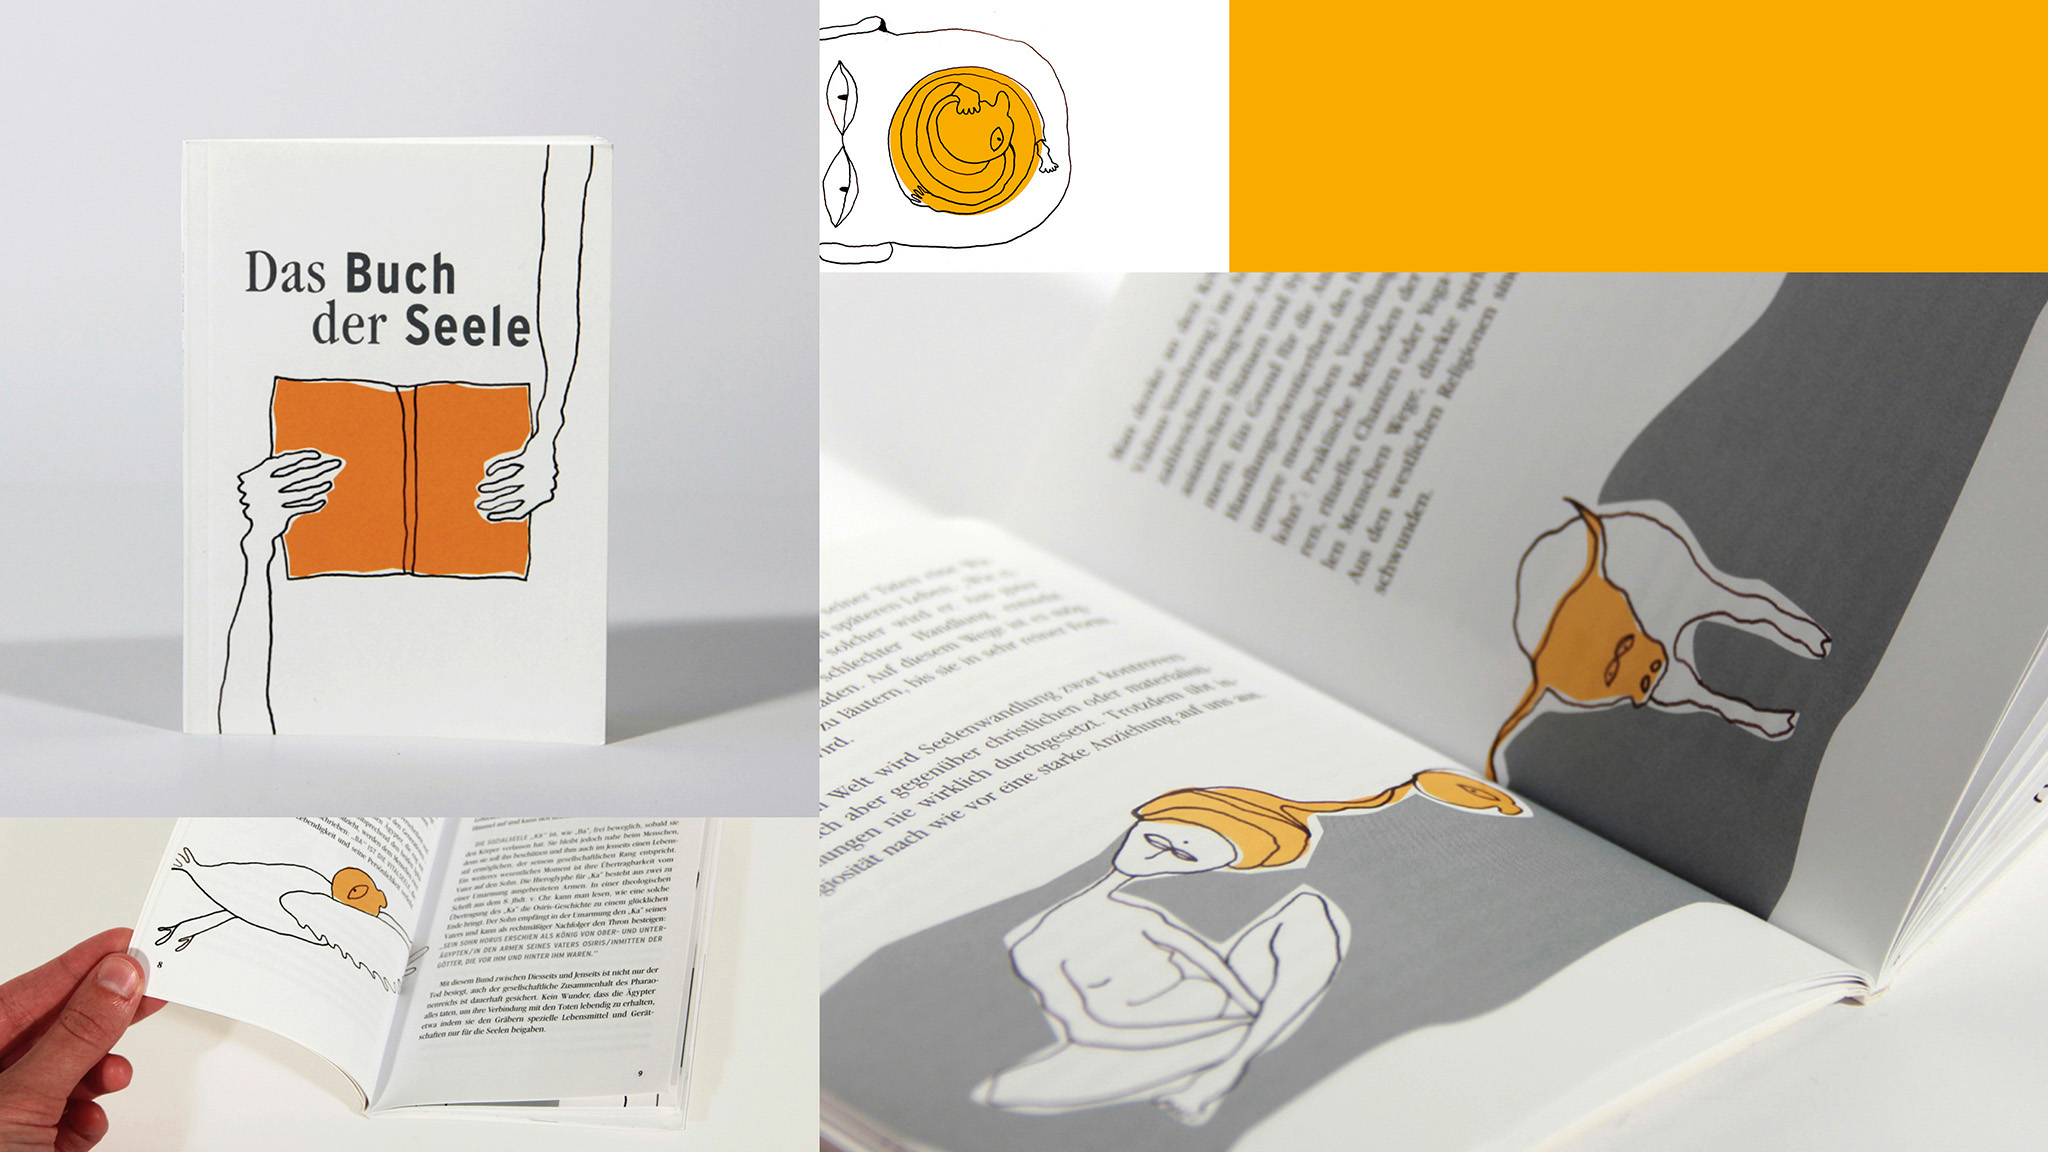 HPC_Buch der Seele_2048x1152px_02